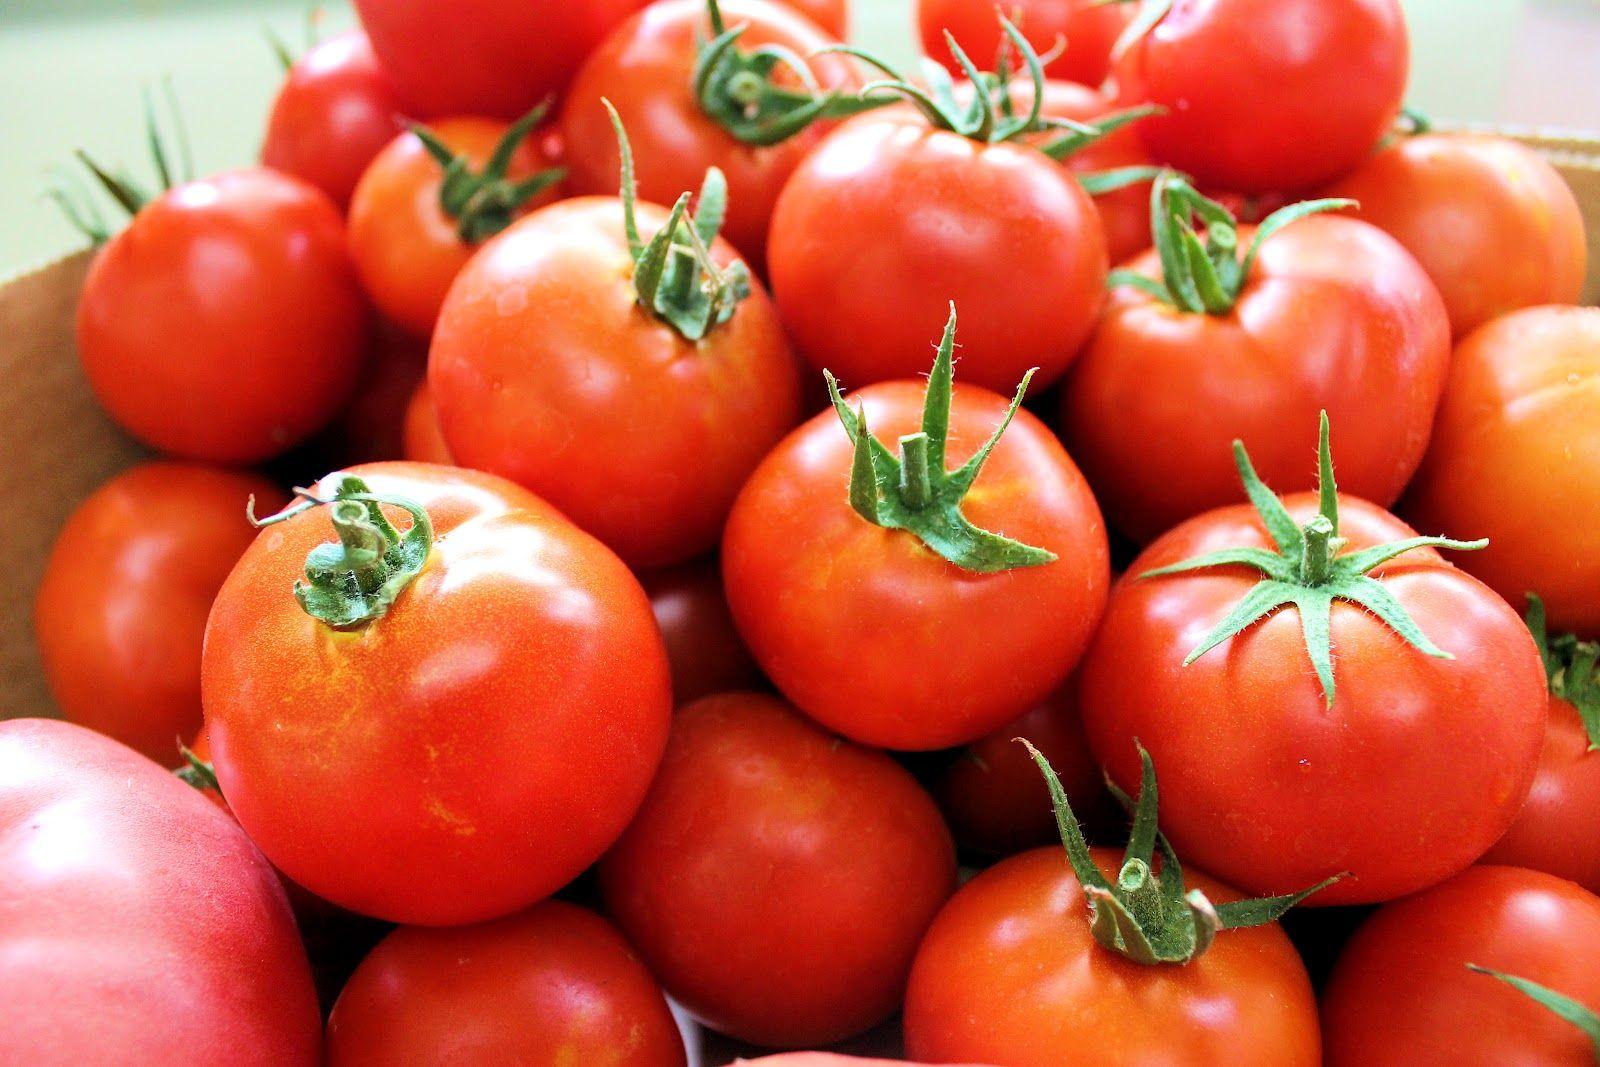 #Tomate. Composición por 100 gramos de porción comestible. Energia (kcal) 19, Agua (g) 93,9, Proteína total (g) 0,9, Lipidos totales (g) 0,1, Glúcidos totales (g) 3,5 Azúcares (g) 3,5, Fibra(g) 1,1 Minerales: Sodio, potasio, calcio, magnesio, fósforo, hierro y zinc. Vitaminas: vitamina A, C, E, tiamina, riboflavina, niacina, B6 y B9. Información obtenida de las tablas de composición de alimentos del CESNID. http://www.nutrigame.es